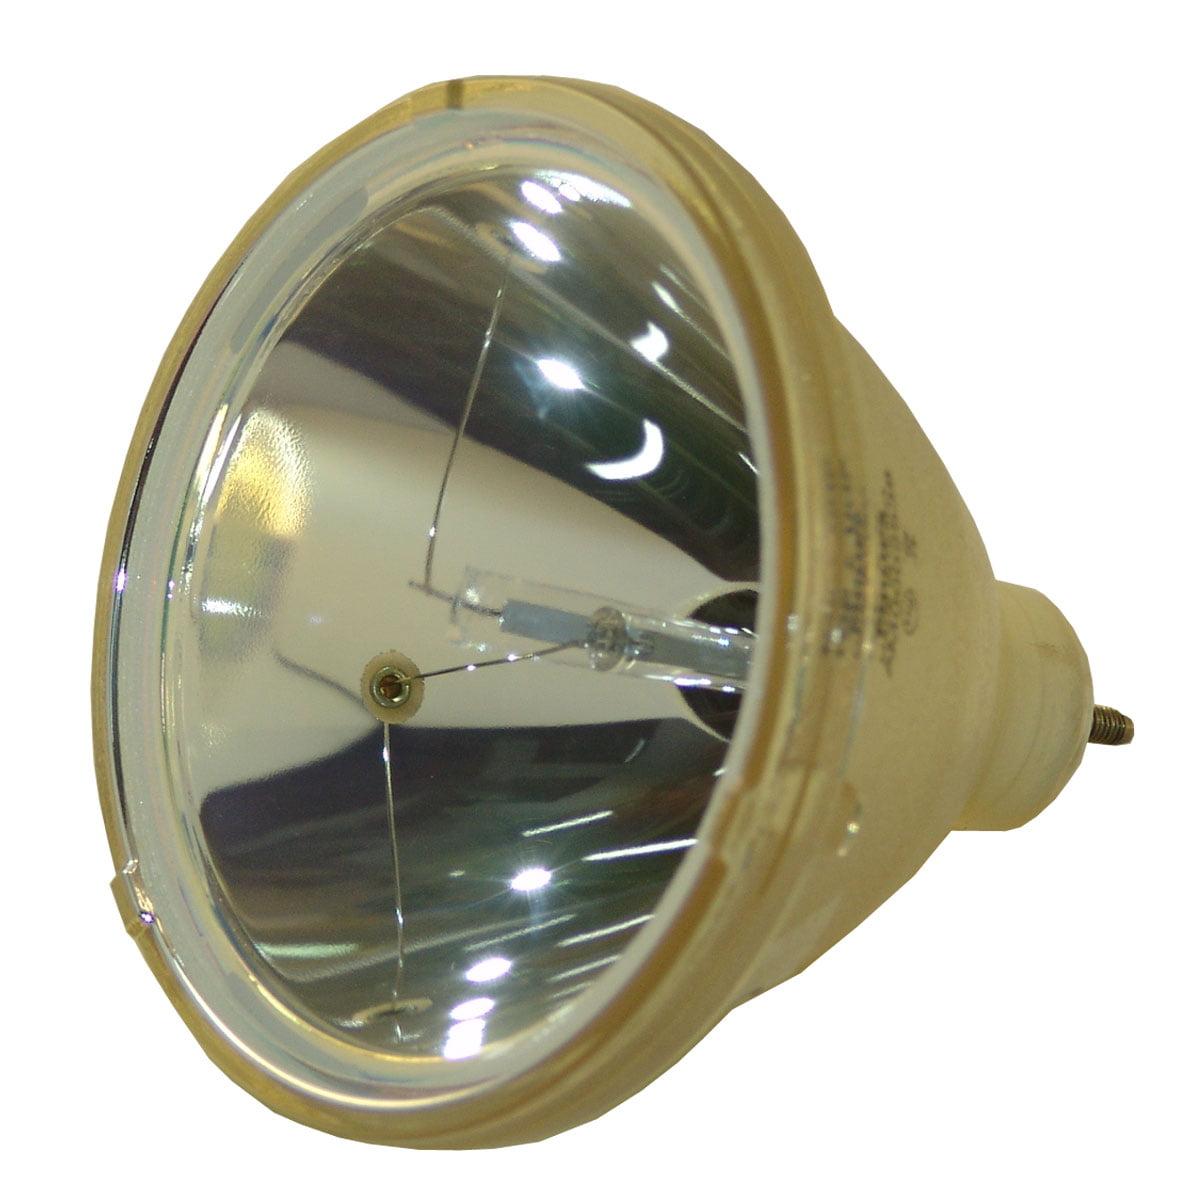 Philips Bare Lamp For Sharp BQC-XGNV6XE / BQCXGNV6XE Projector DLP LCD Bulb